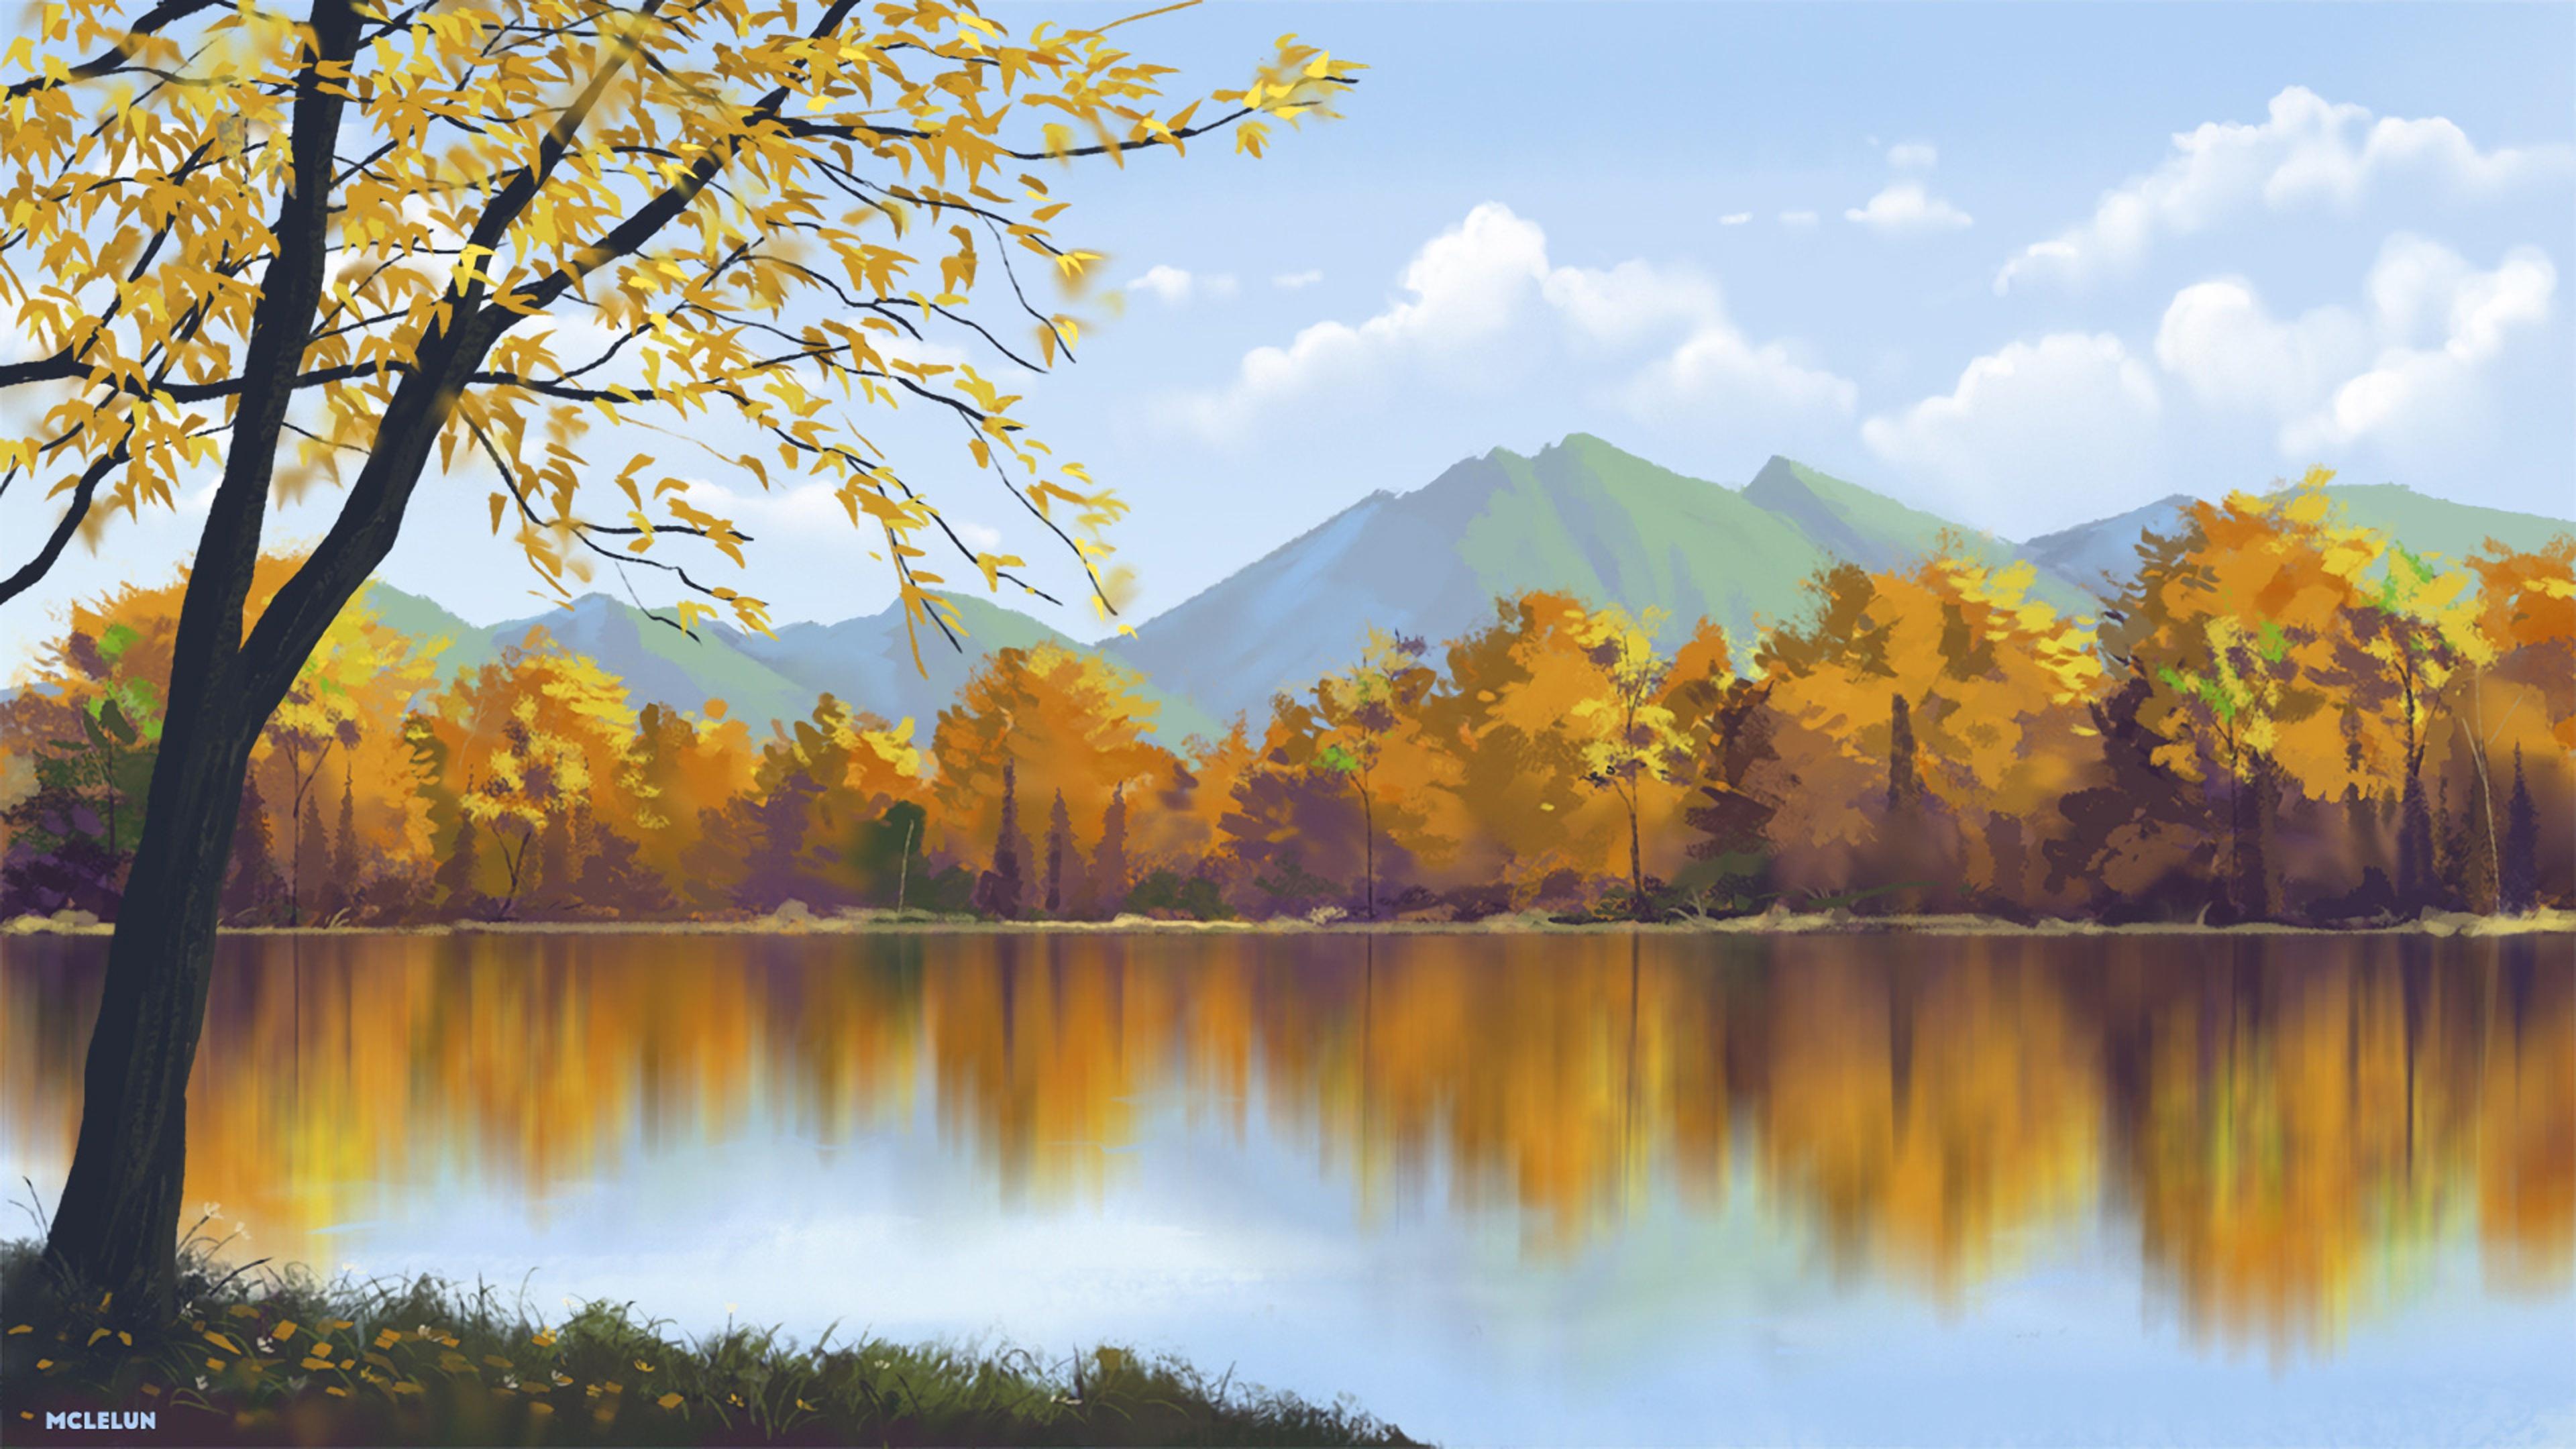 Fall Art pc wallpaper